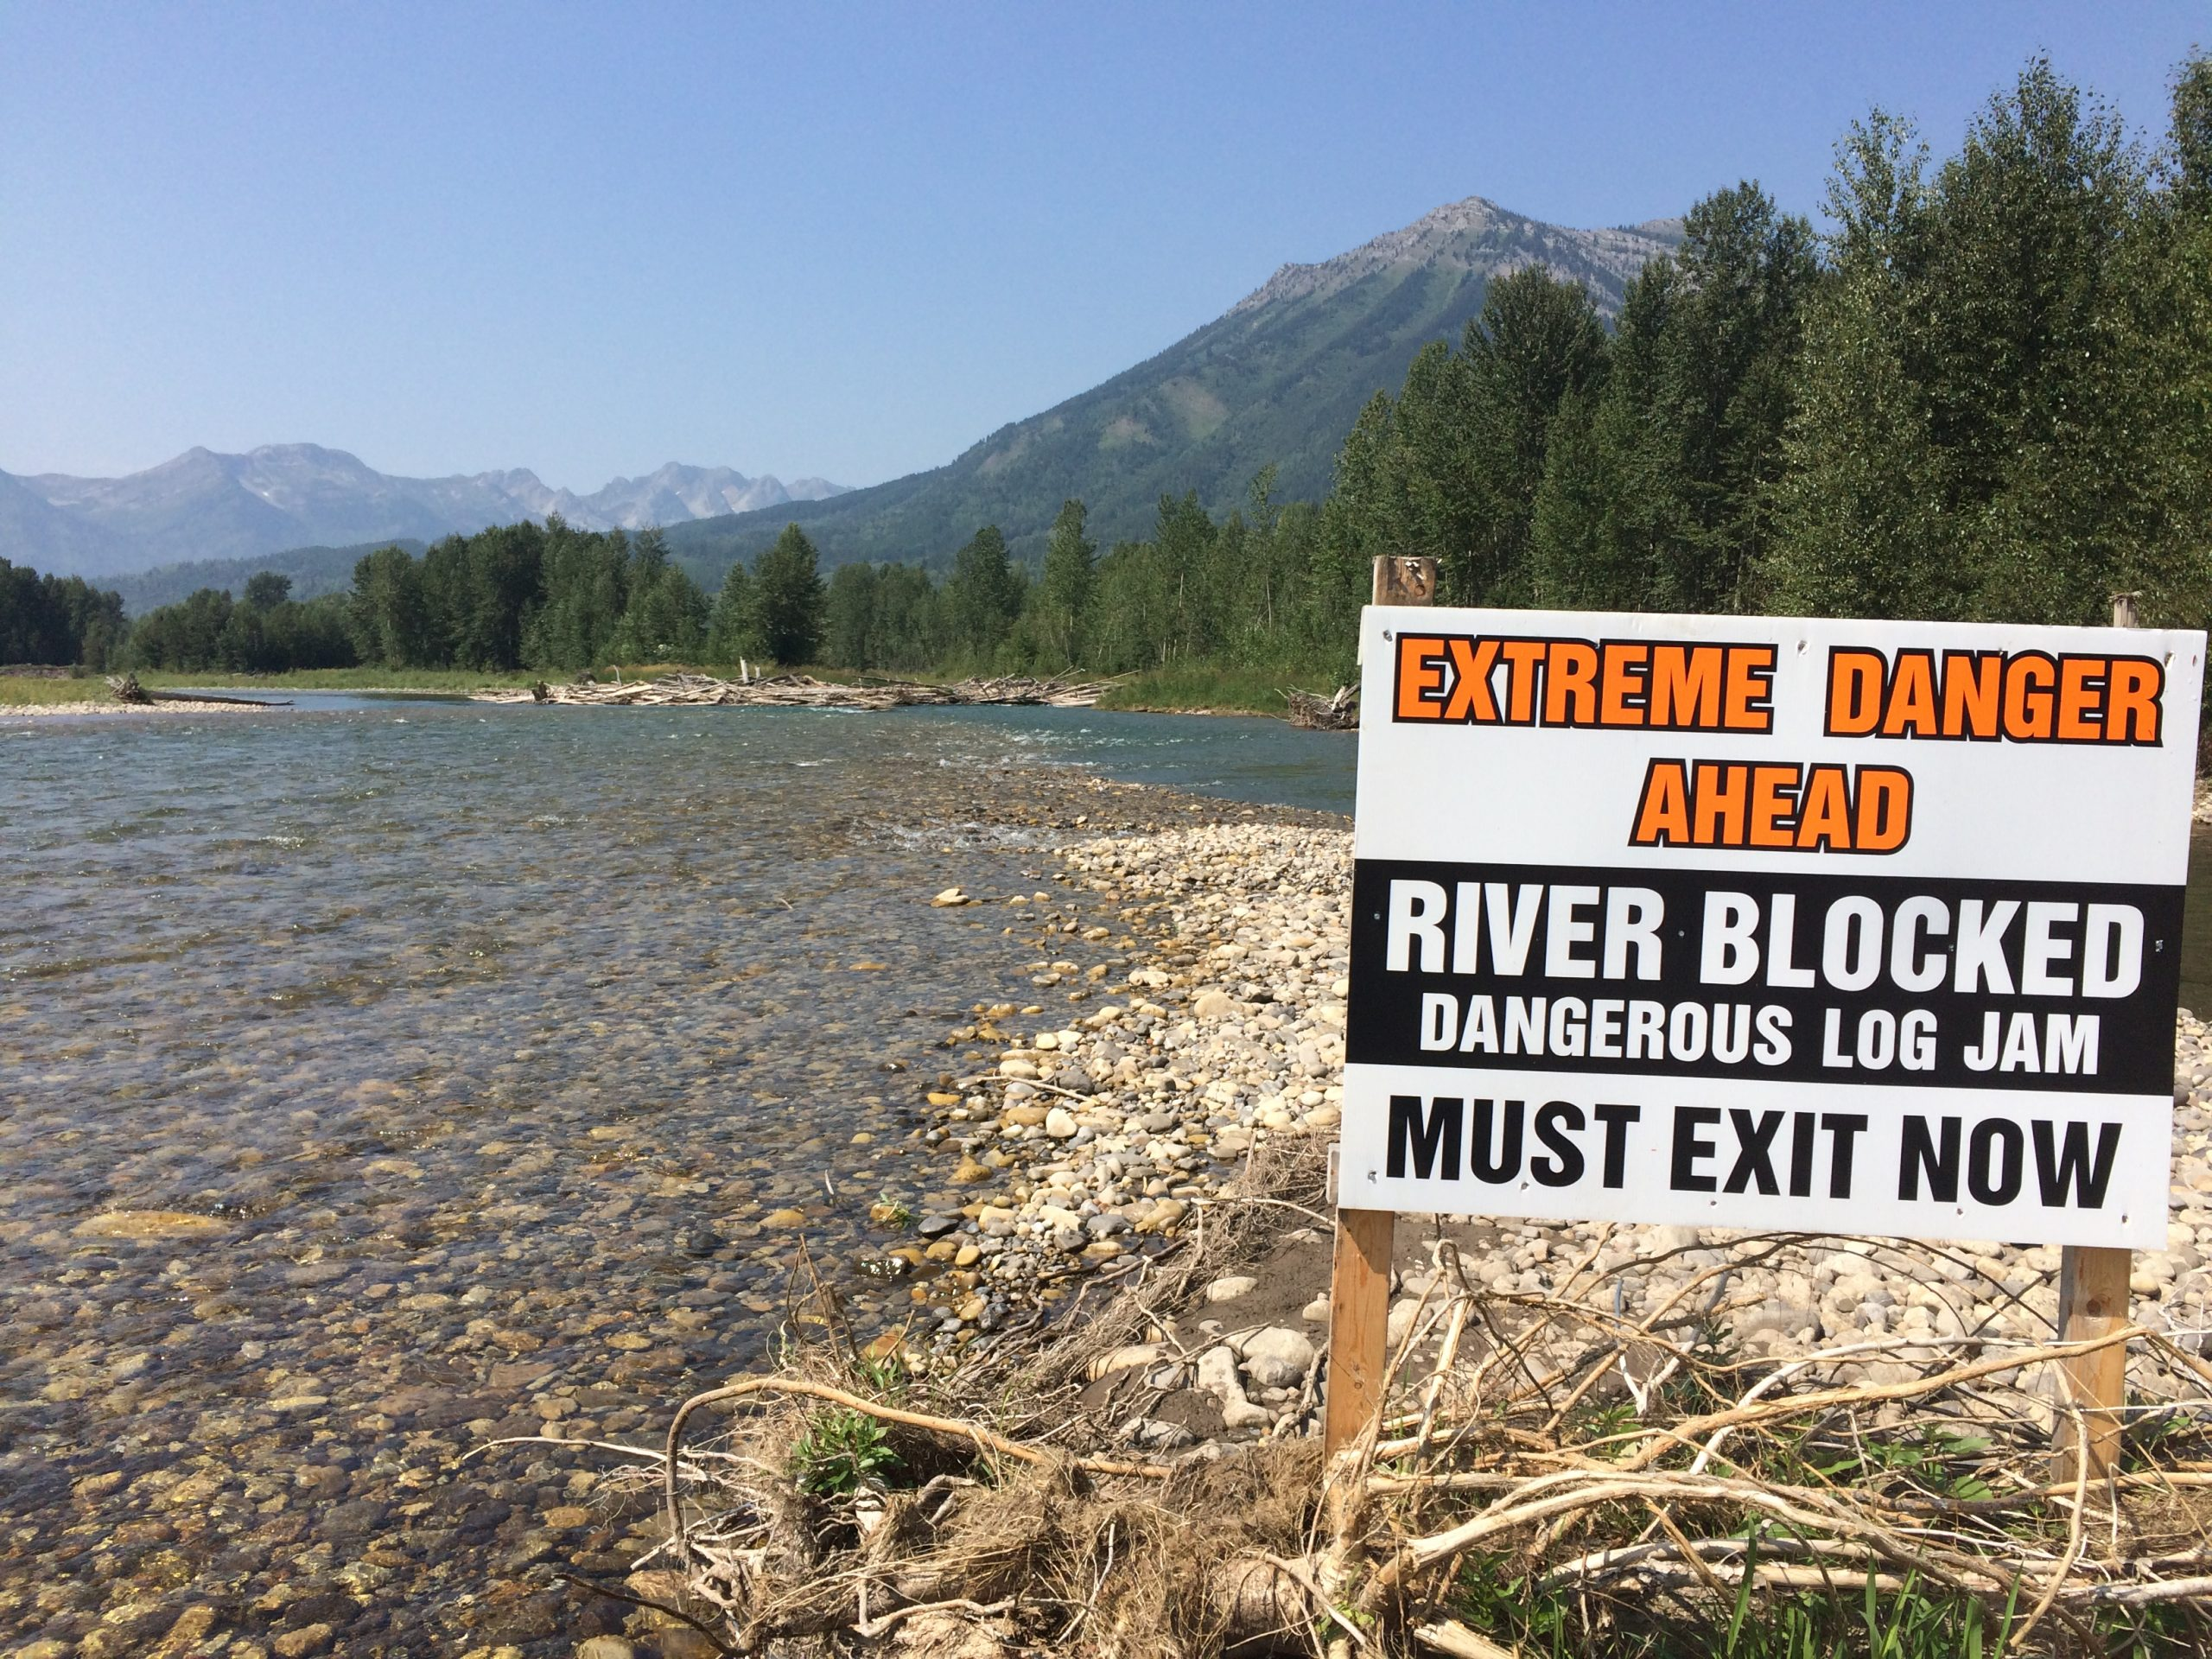 Residents warned of dangerous log jam near Fernie